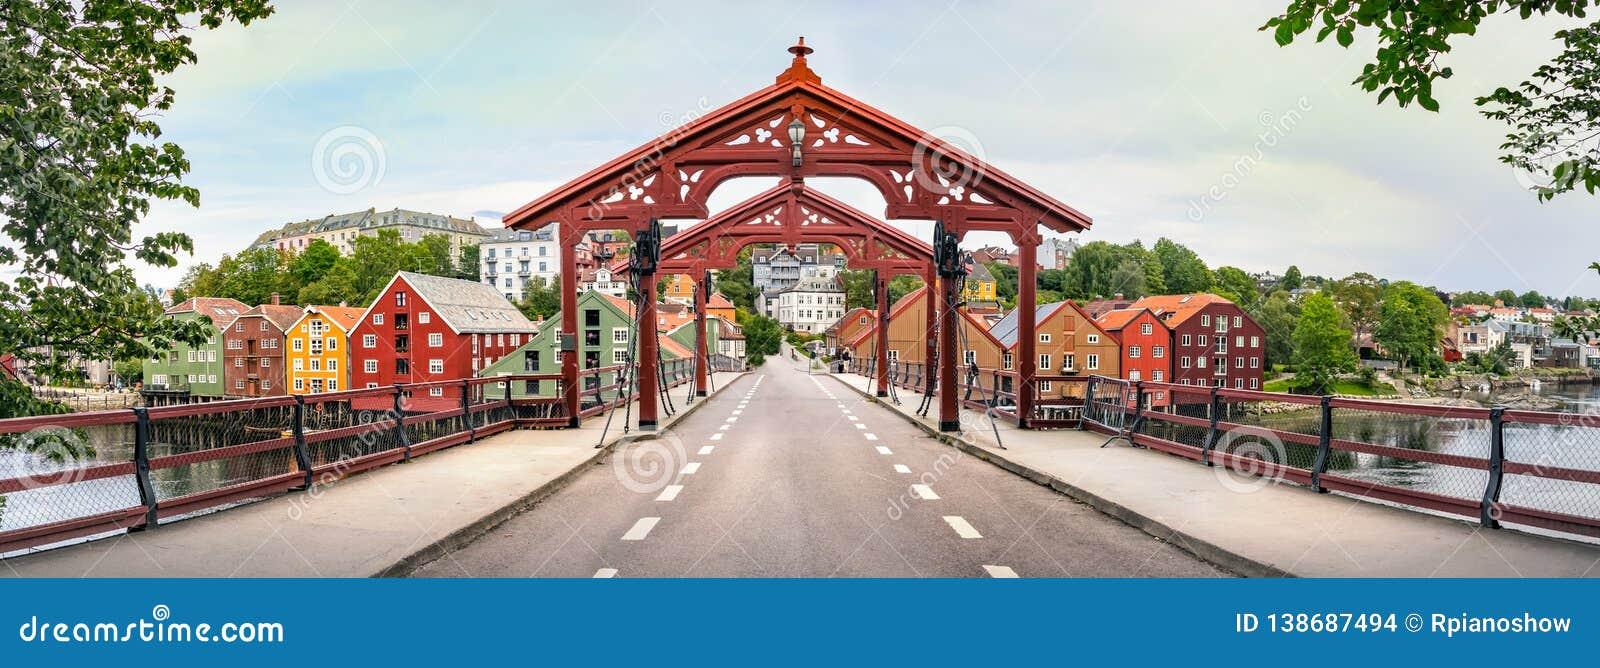 Panorama of the Old Town Bridge or Gamle Bybro of Trondheim, Norway